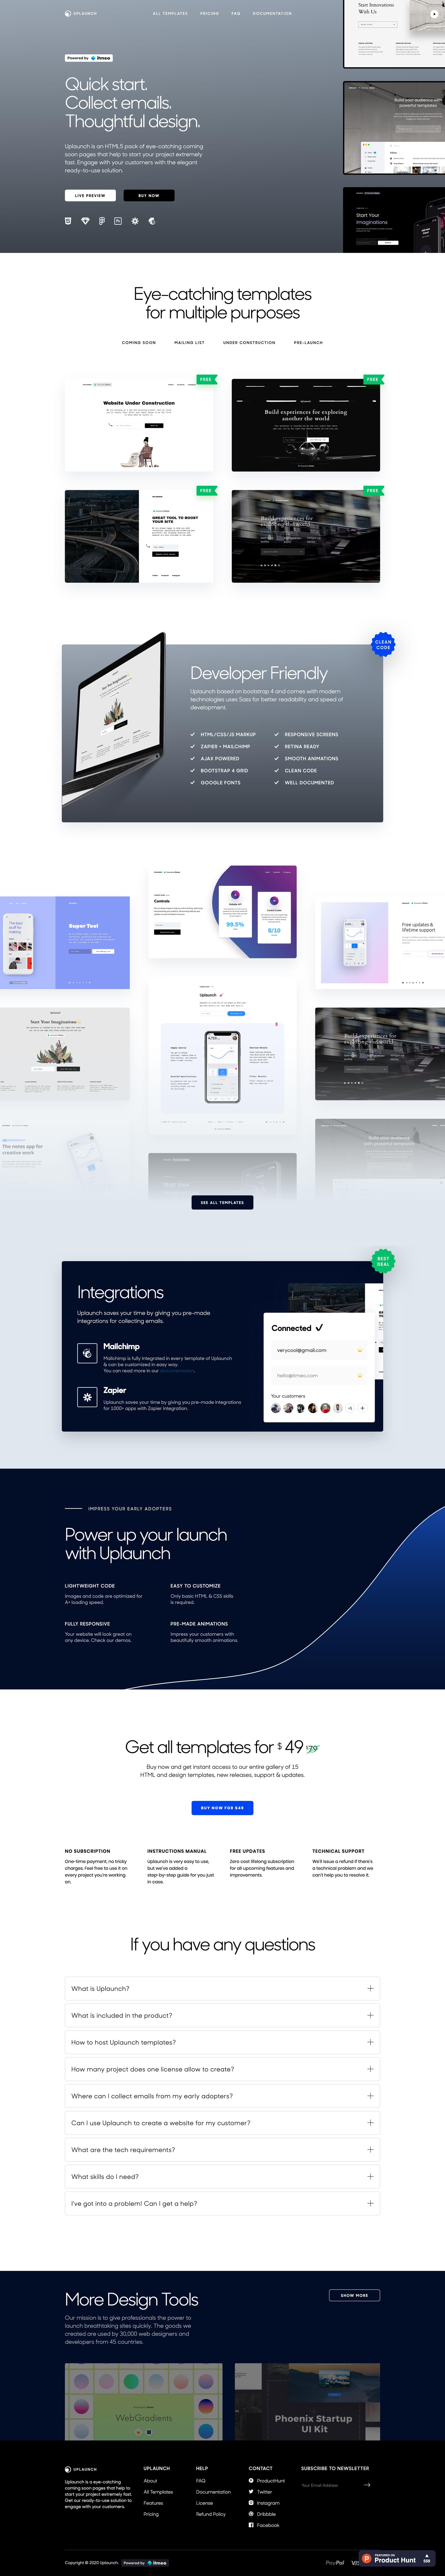 Uplaunch Website Screenshot